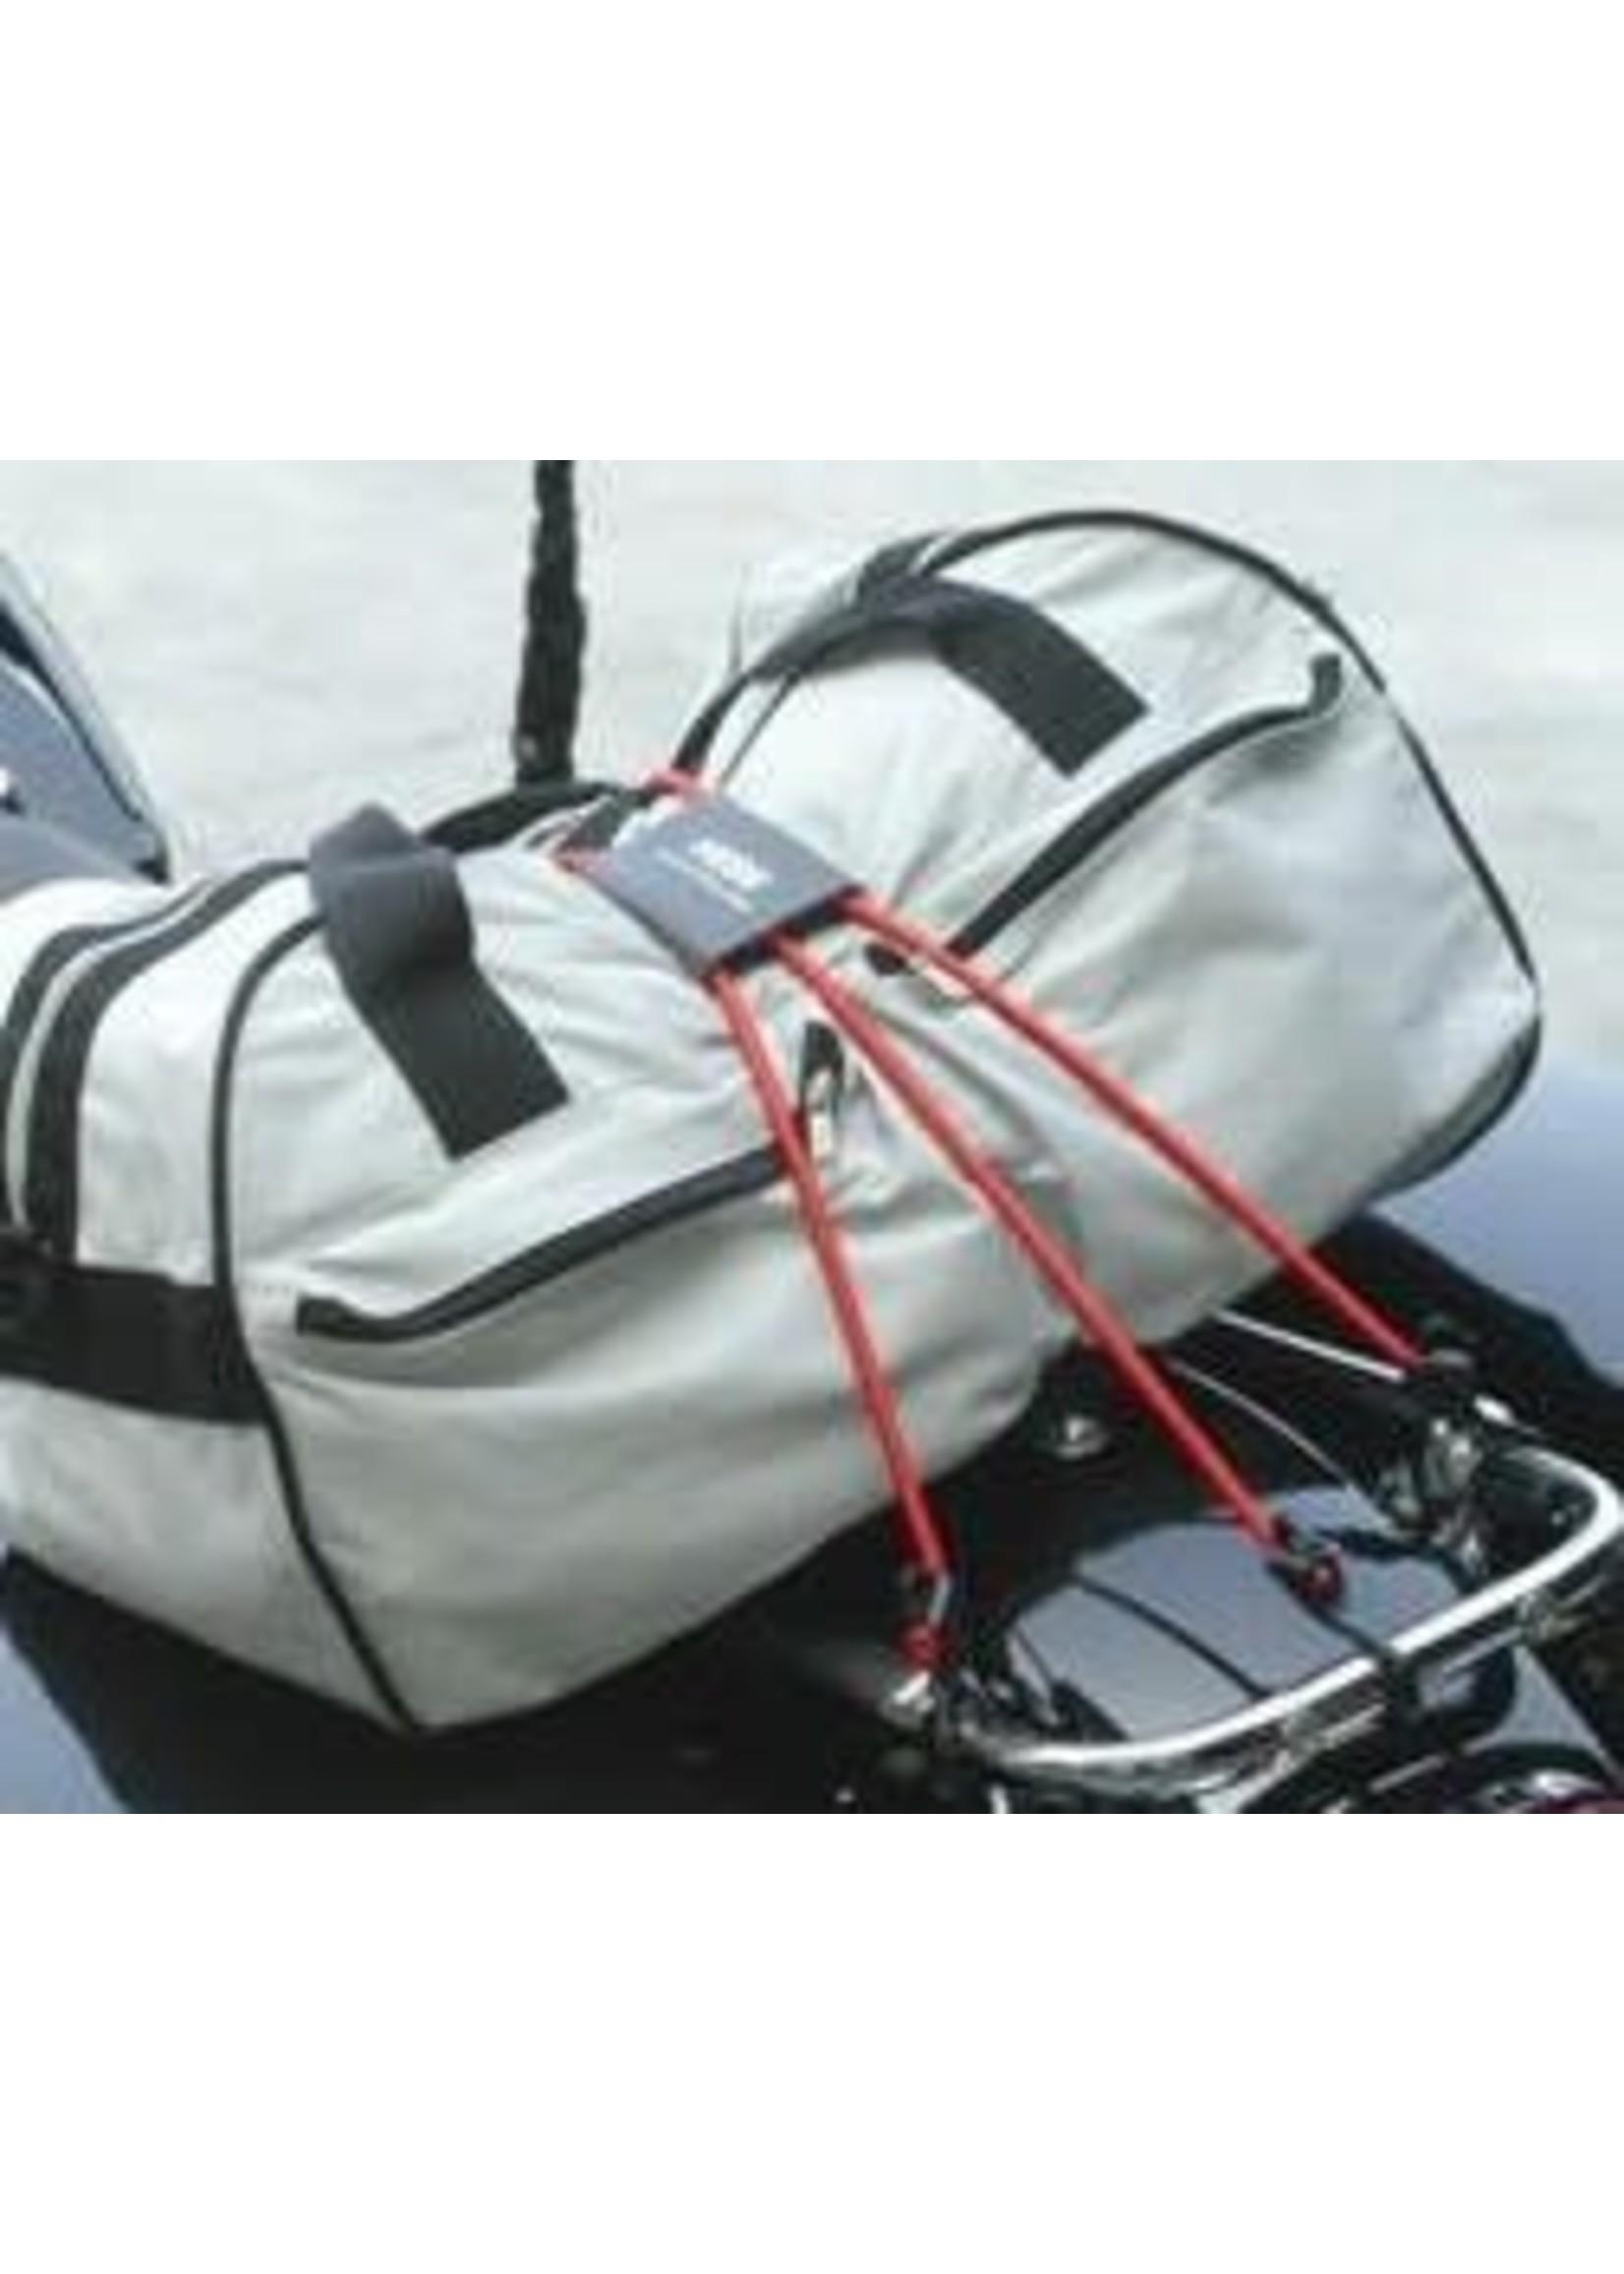 Grand Canyon Bikewear BAGAGE SPIN 70/125CM